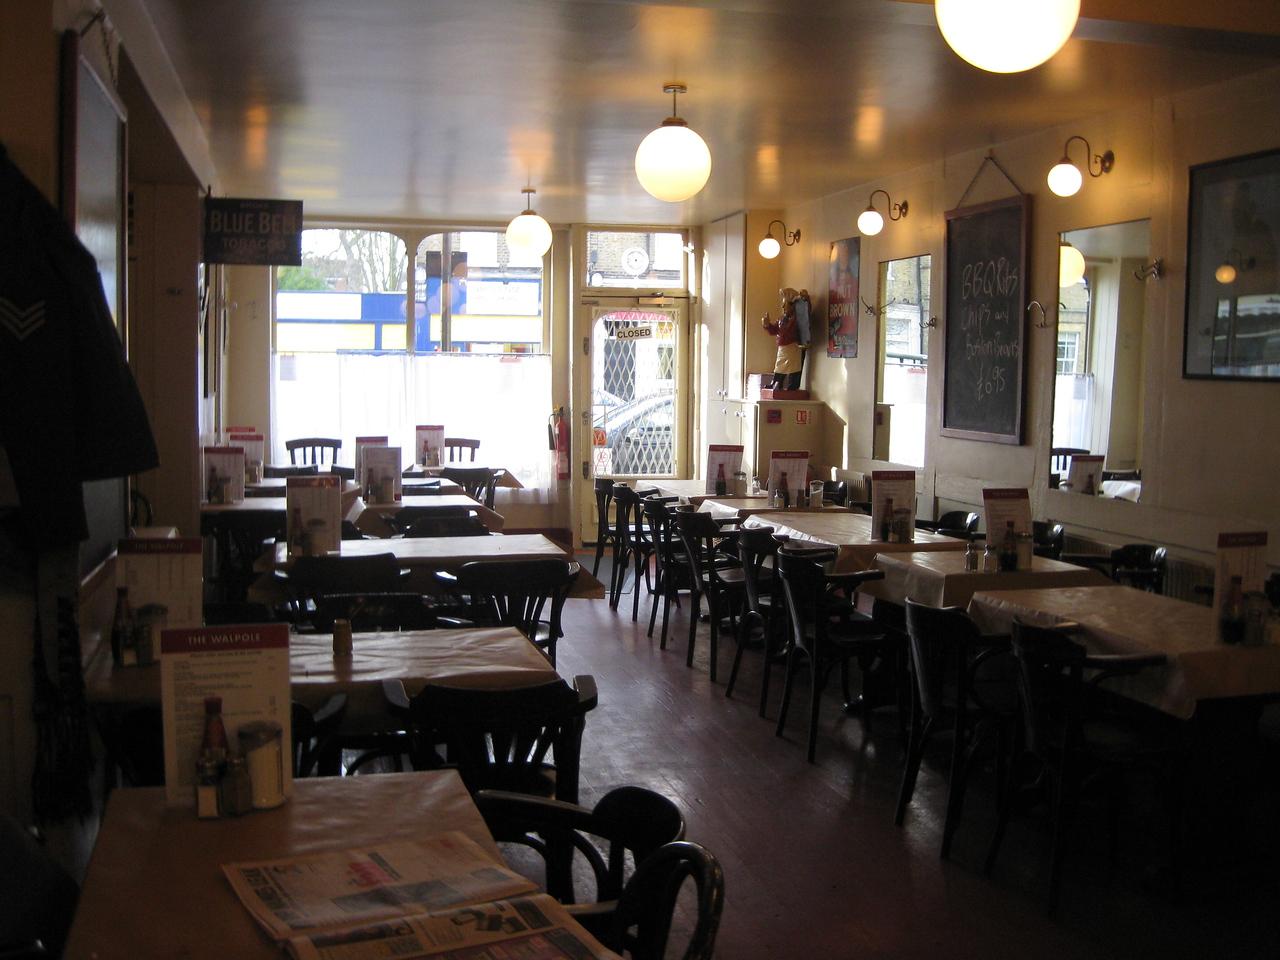 The Walpole Restaurant - Inside